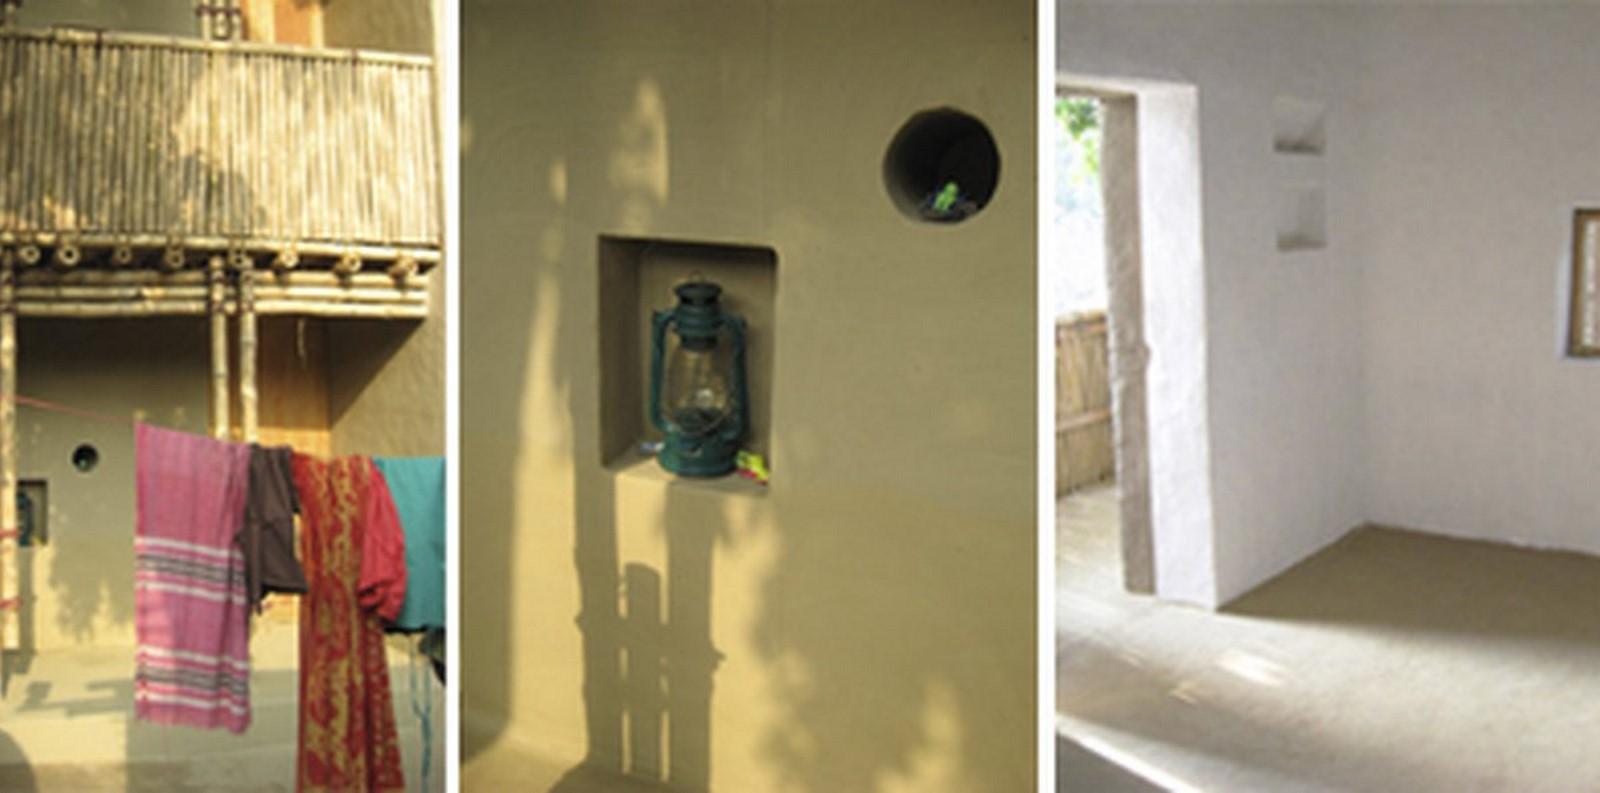 HOMEmade – Family houses in Bangladesh - Sheet2